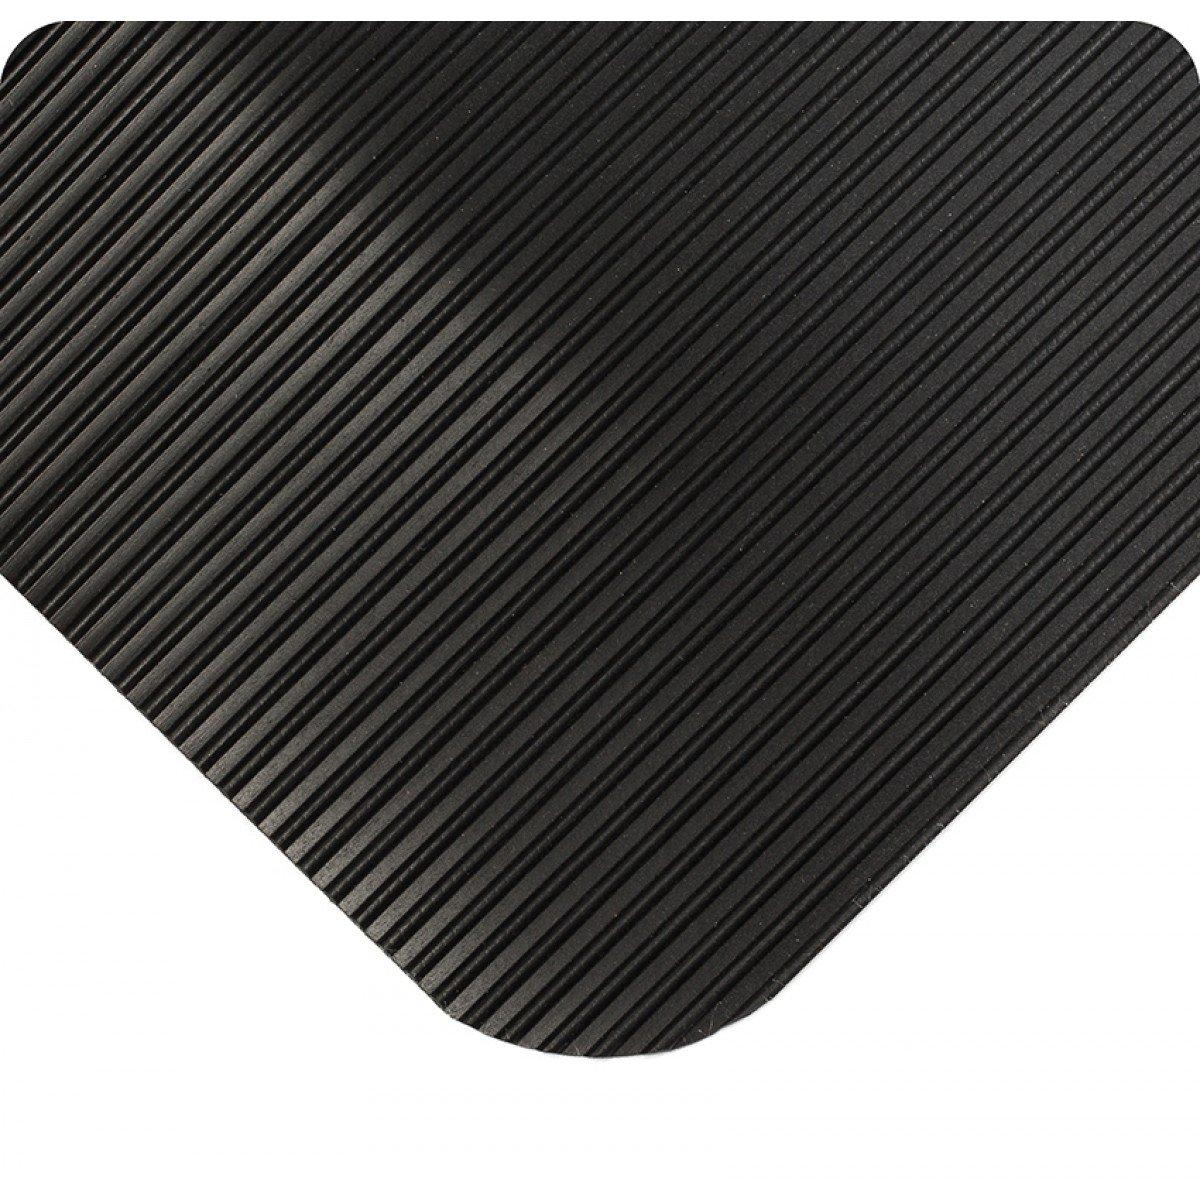 21 Length x 4 Width x 7//8 Thick Wearwell 433.78x4x21BK ComfortPro Mat Black